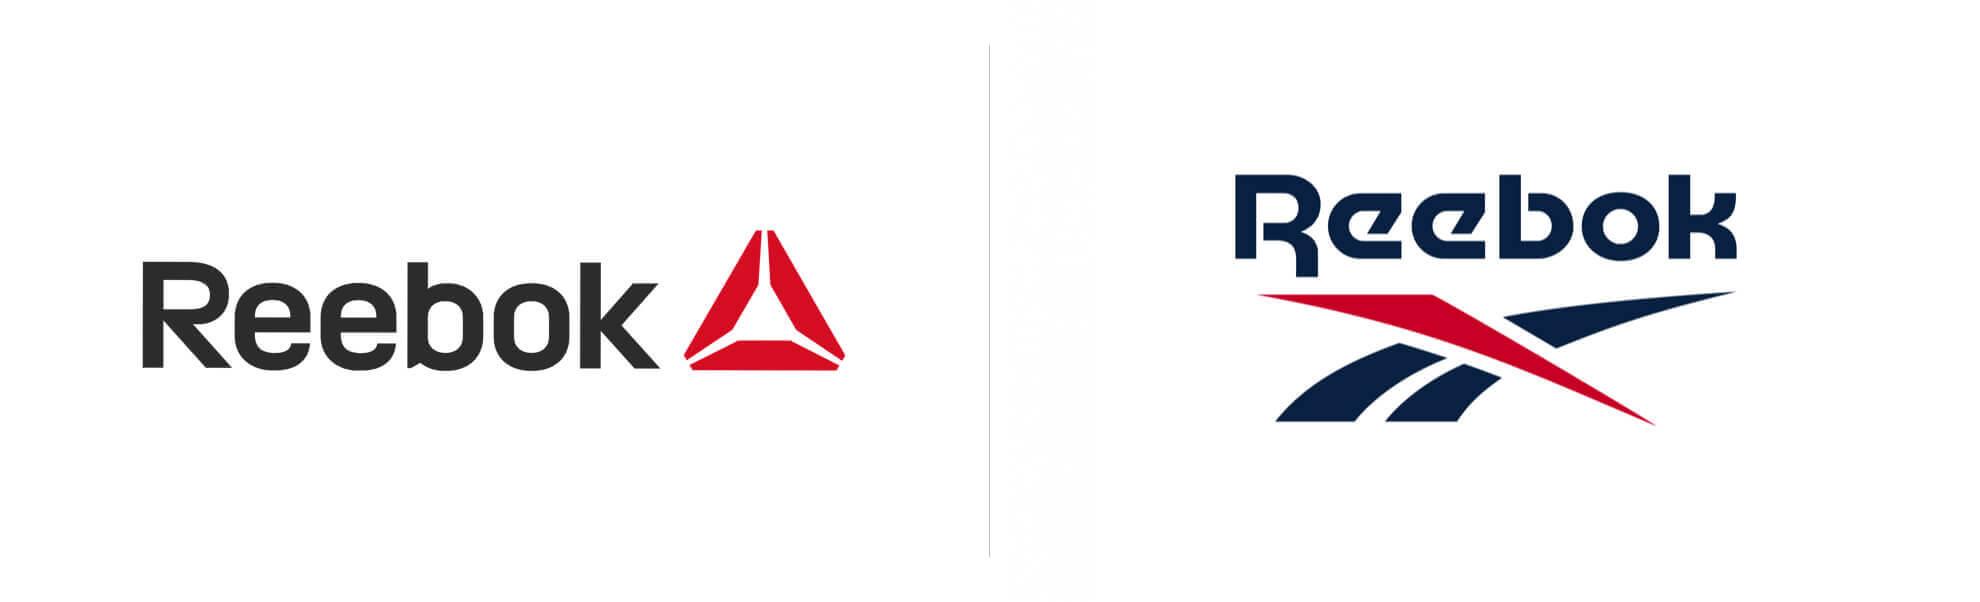 Reebok wraca dostarego logo